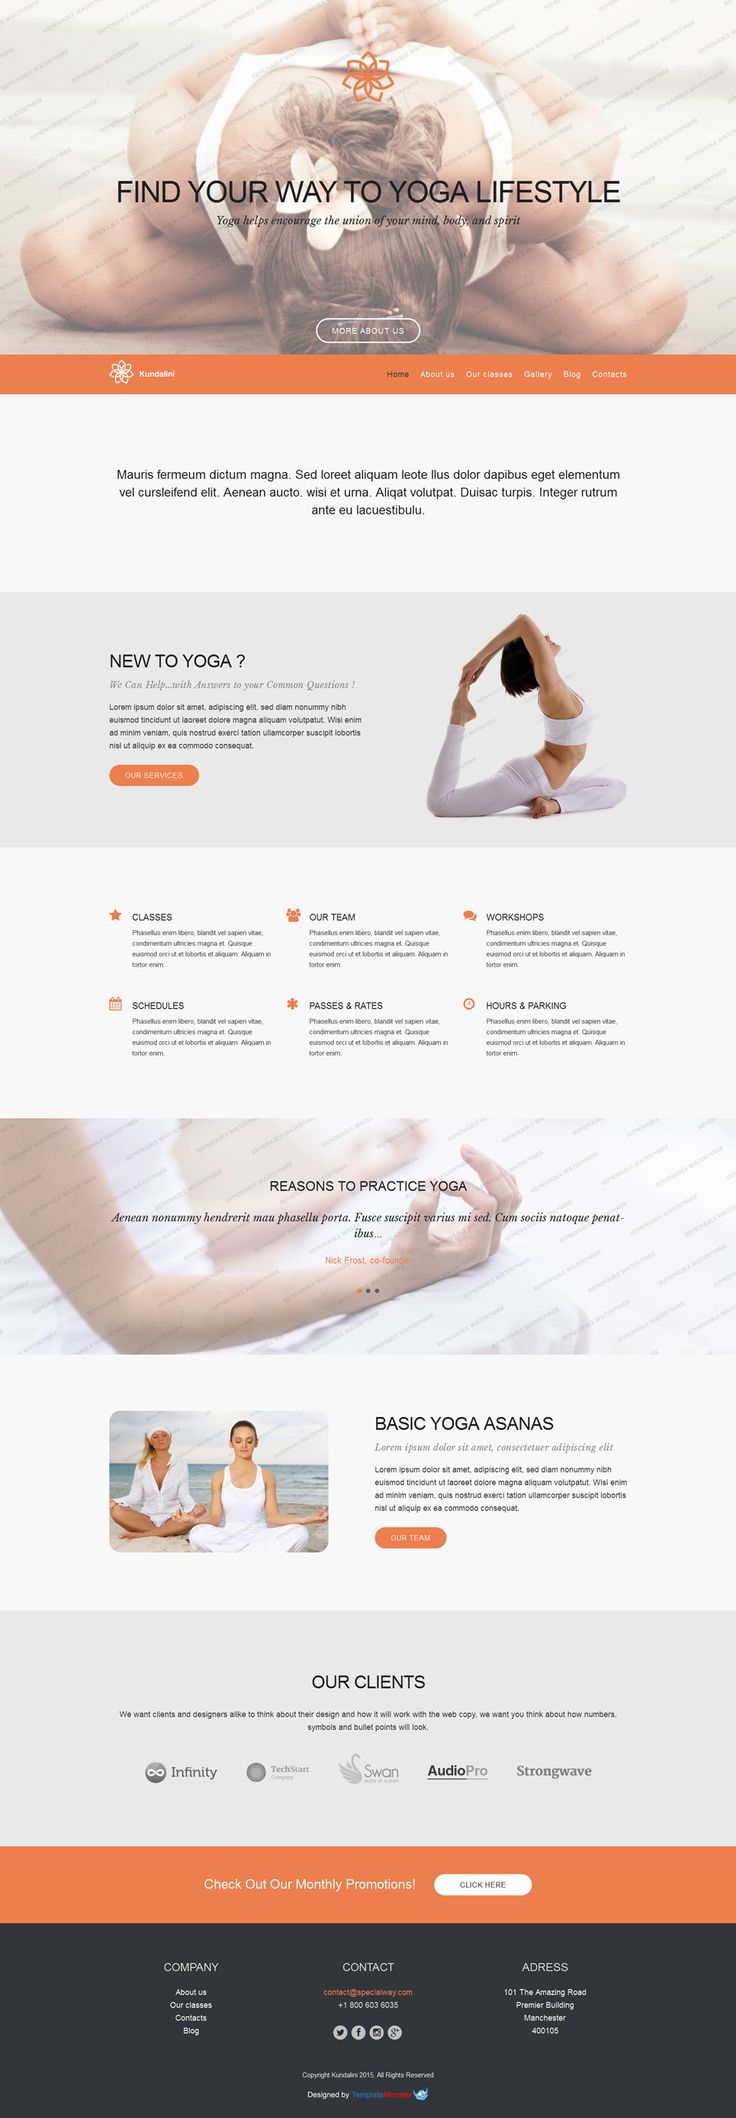 Mejores 18 imágenes de Yoga Website Templates en Pinterest ...